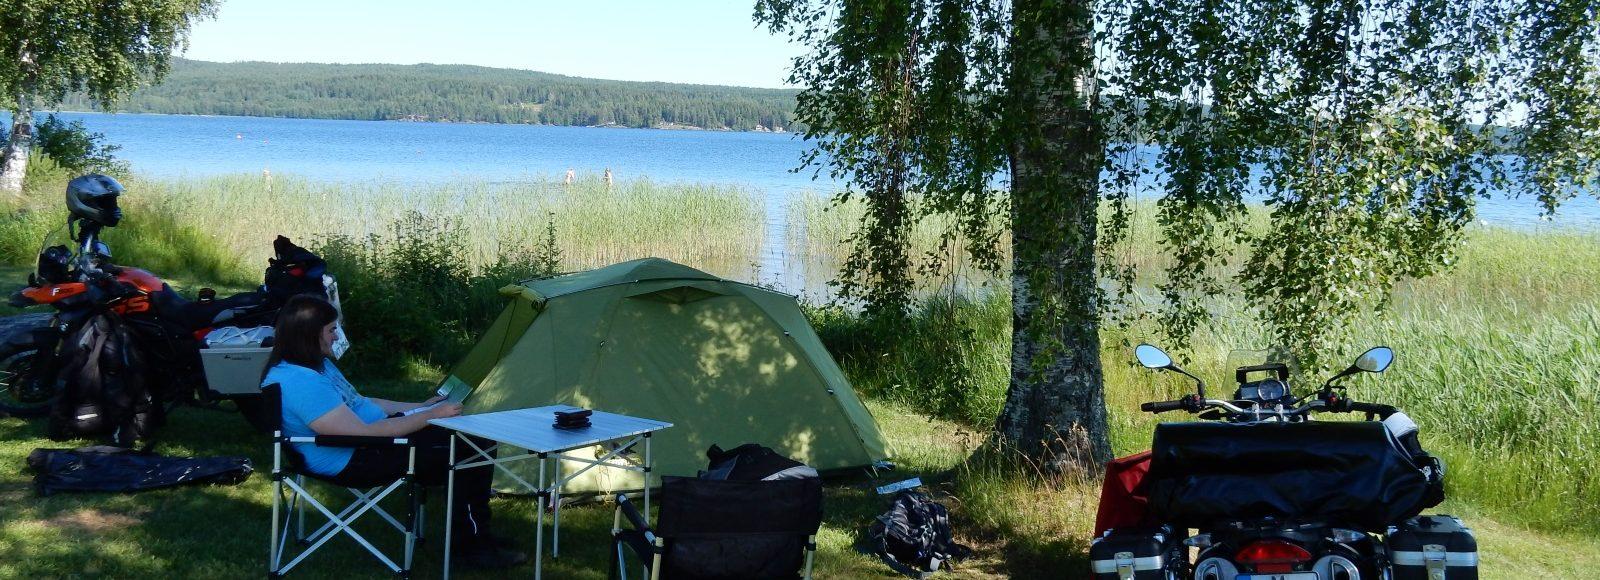 Unser Campingplatz nahe Eda in Schweden.